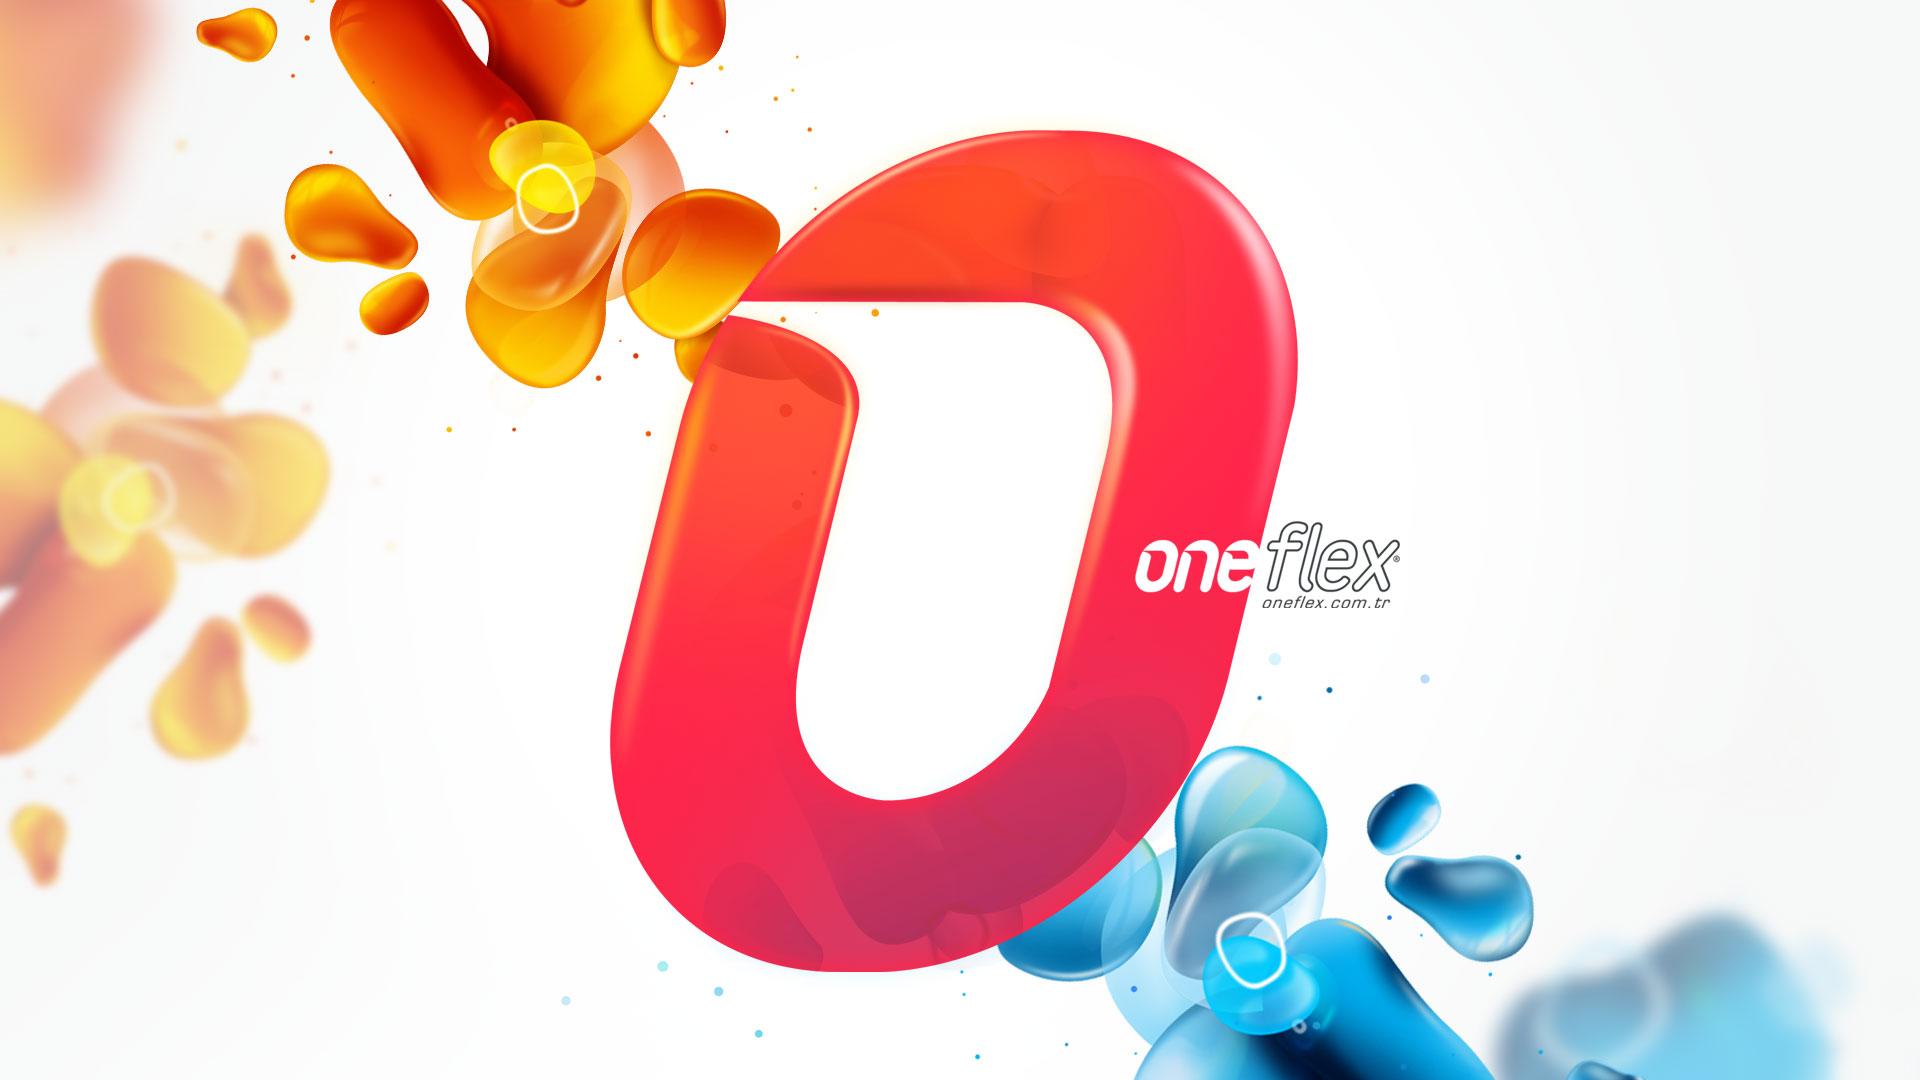 oneflex_01